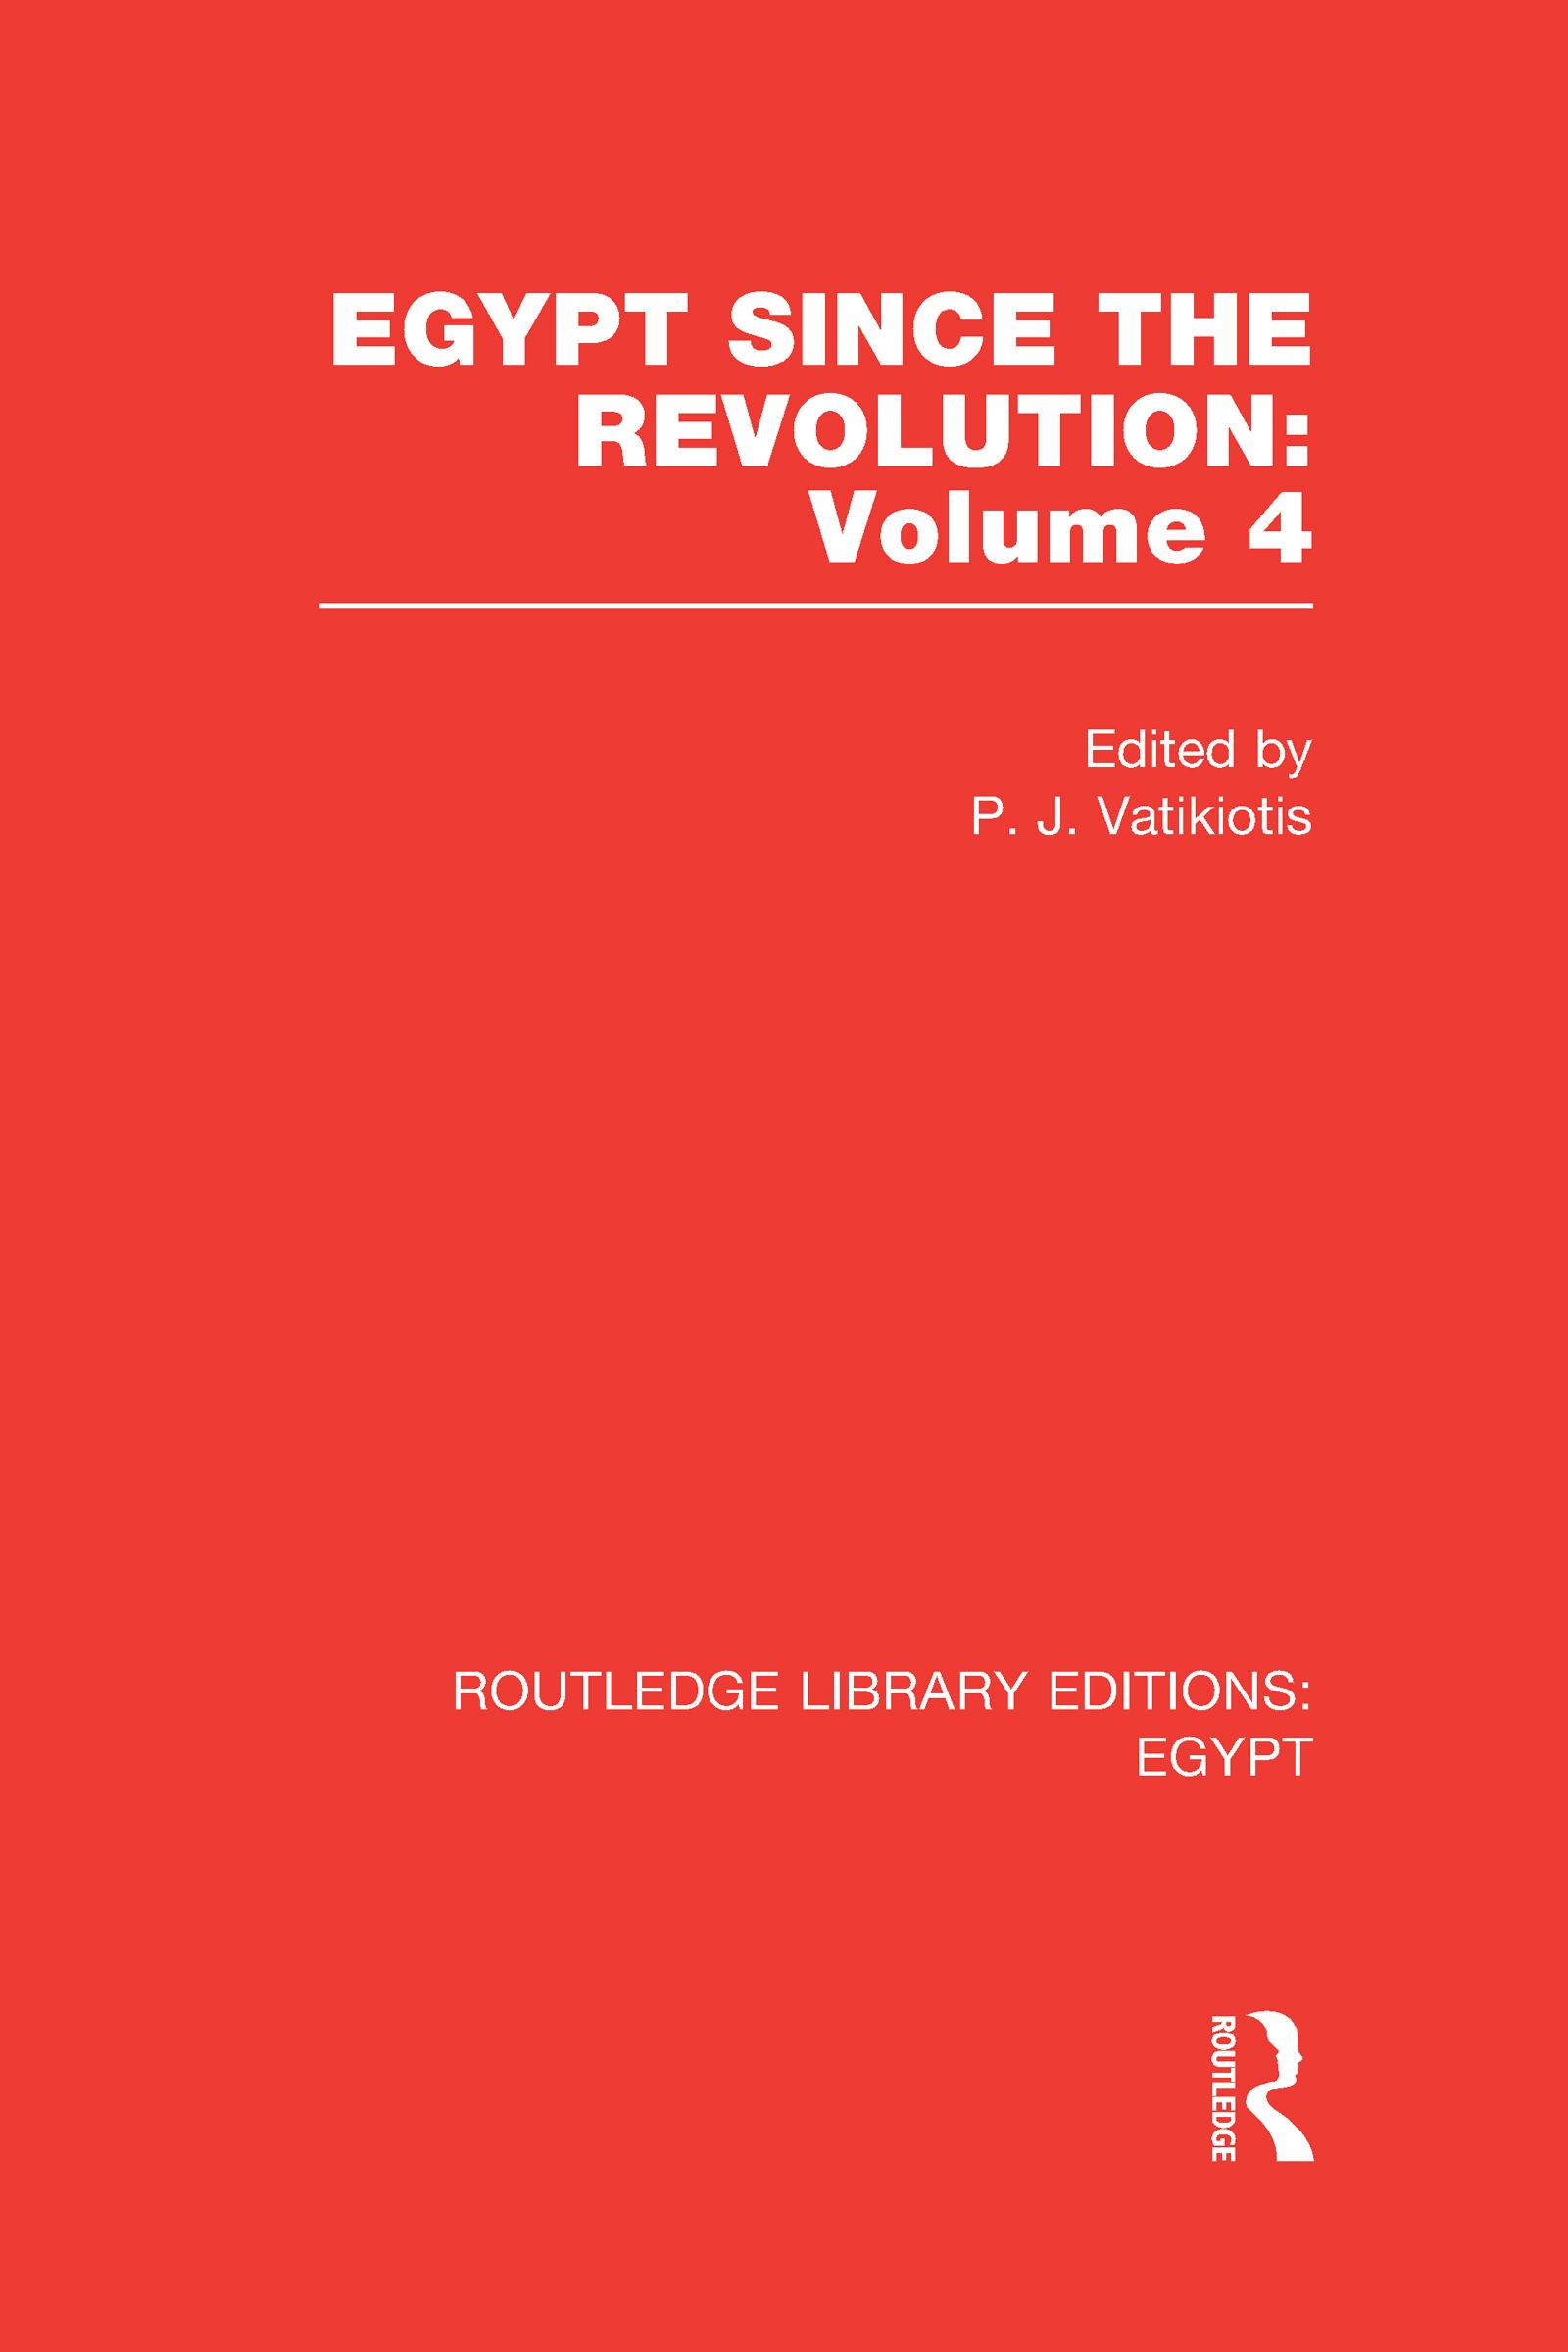 Egypt Since the Revolution (RLE Egypt) (Hardback) book cover